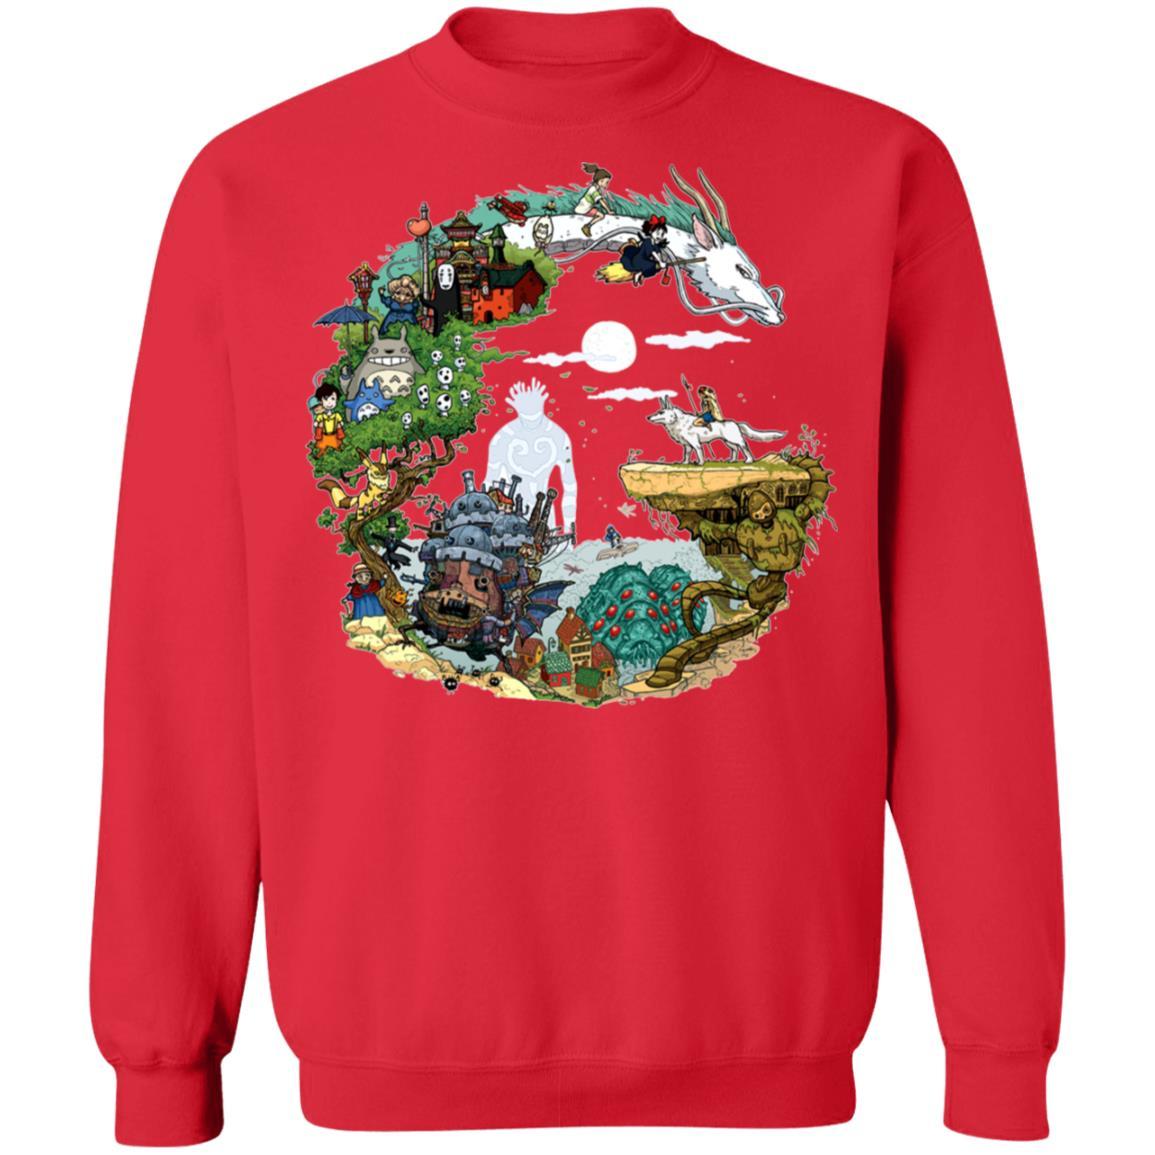 Ghibli Movie Circle Sweatshirt